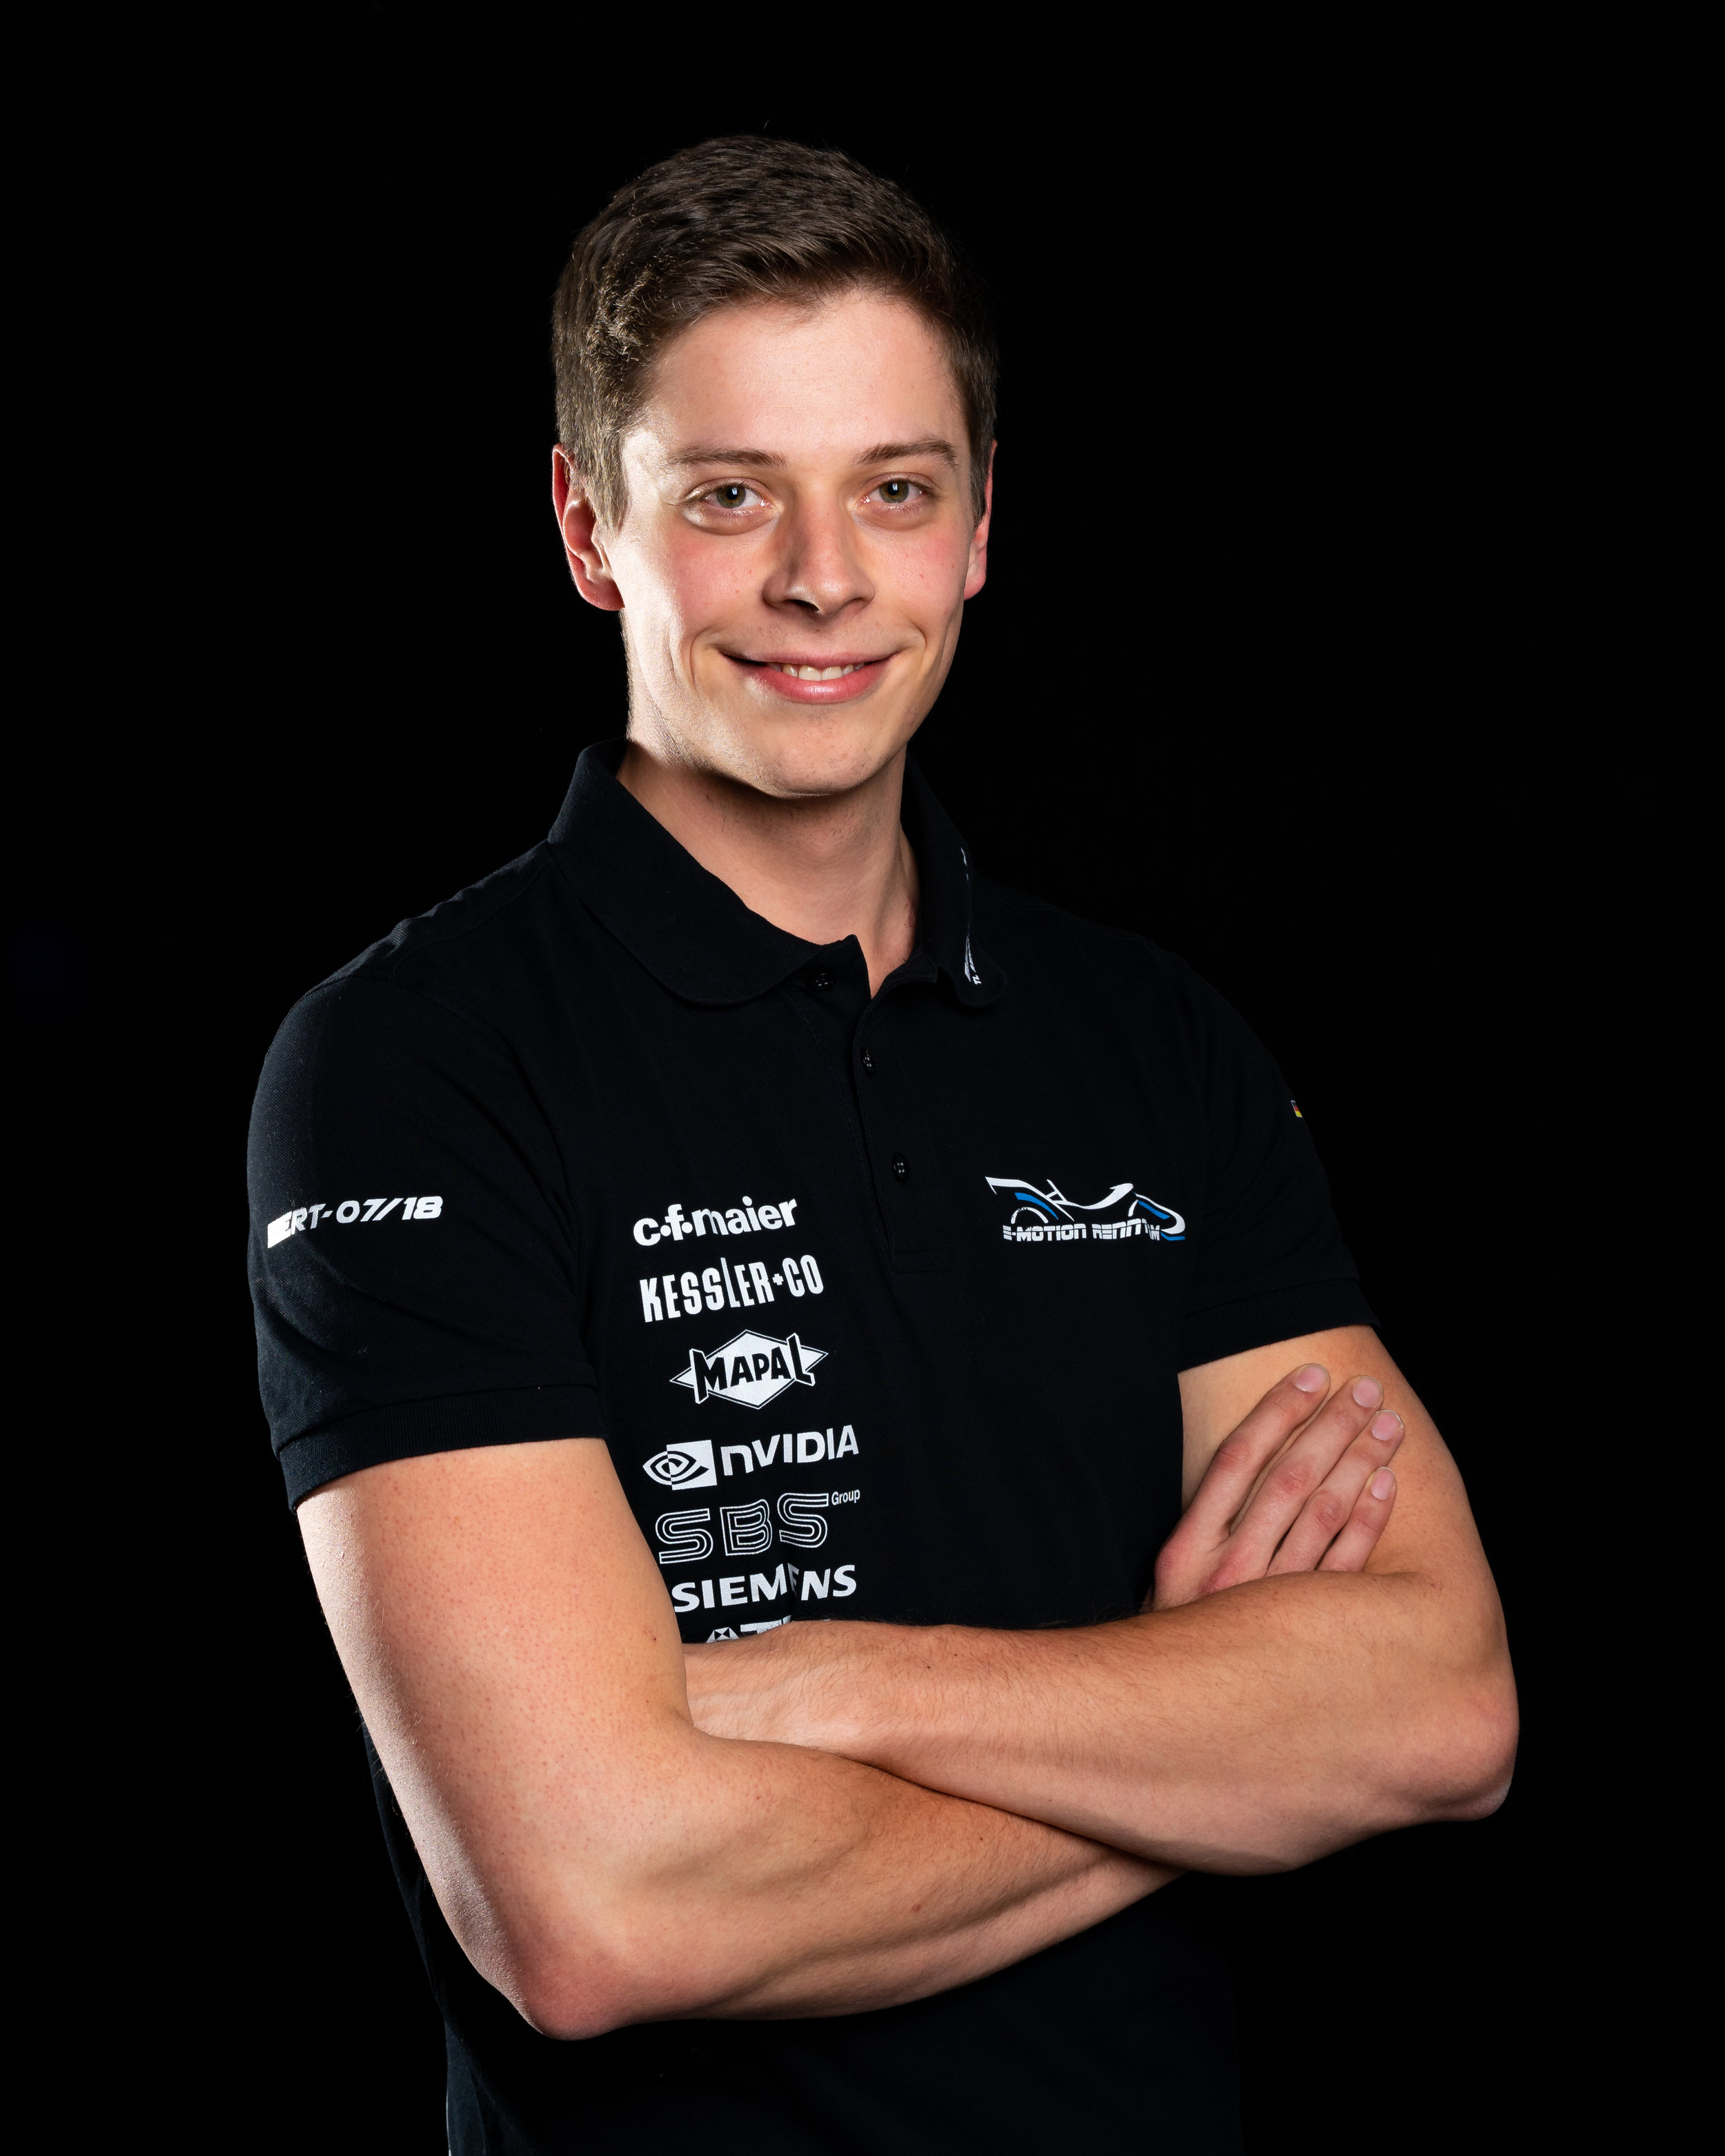 Benjamin Maihöfer